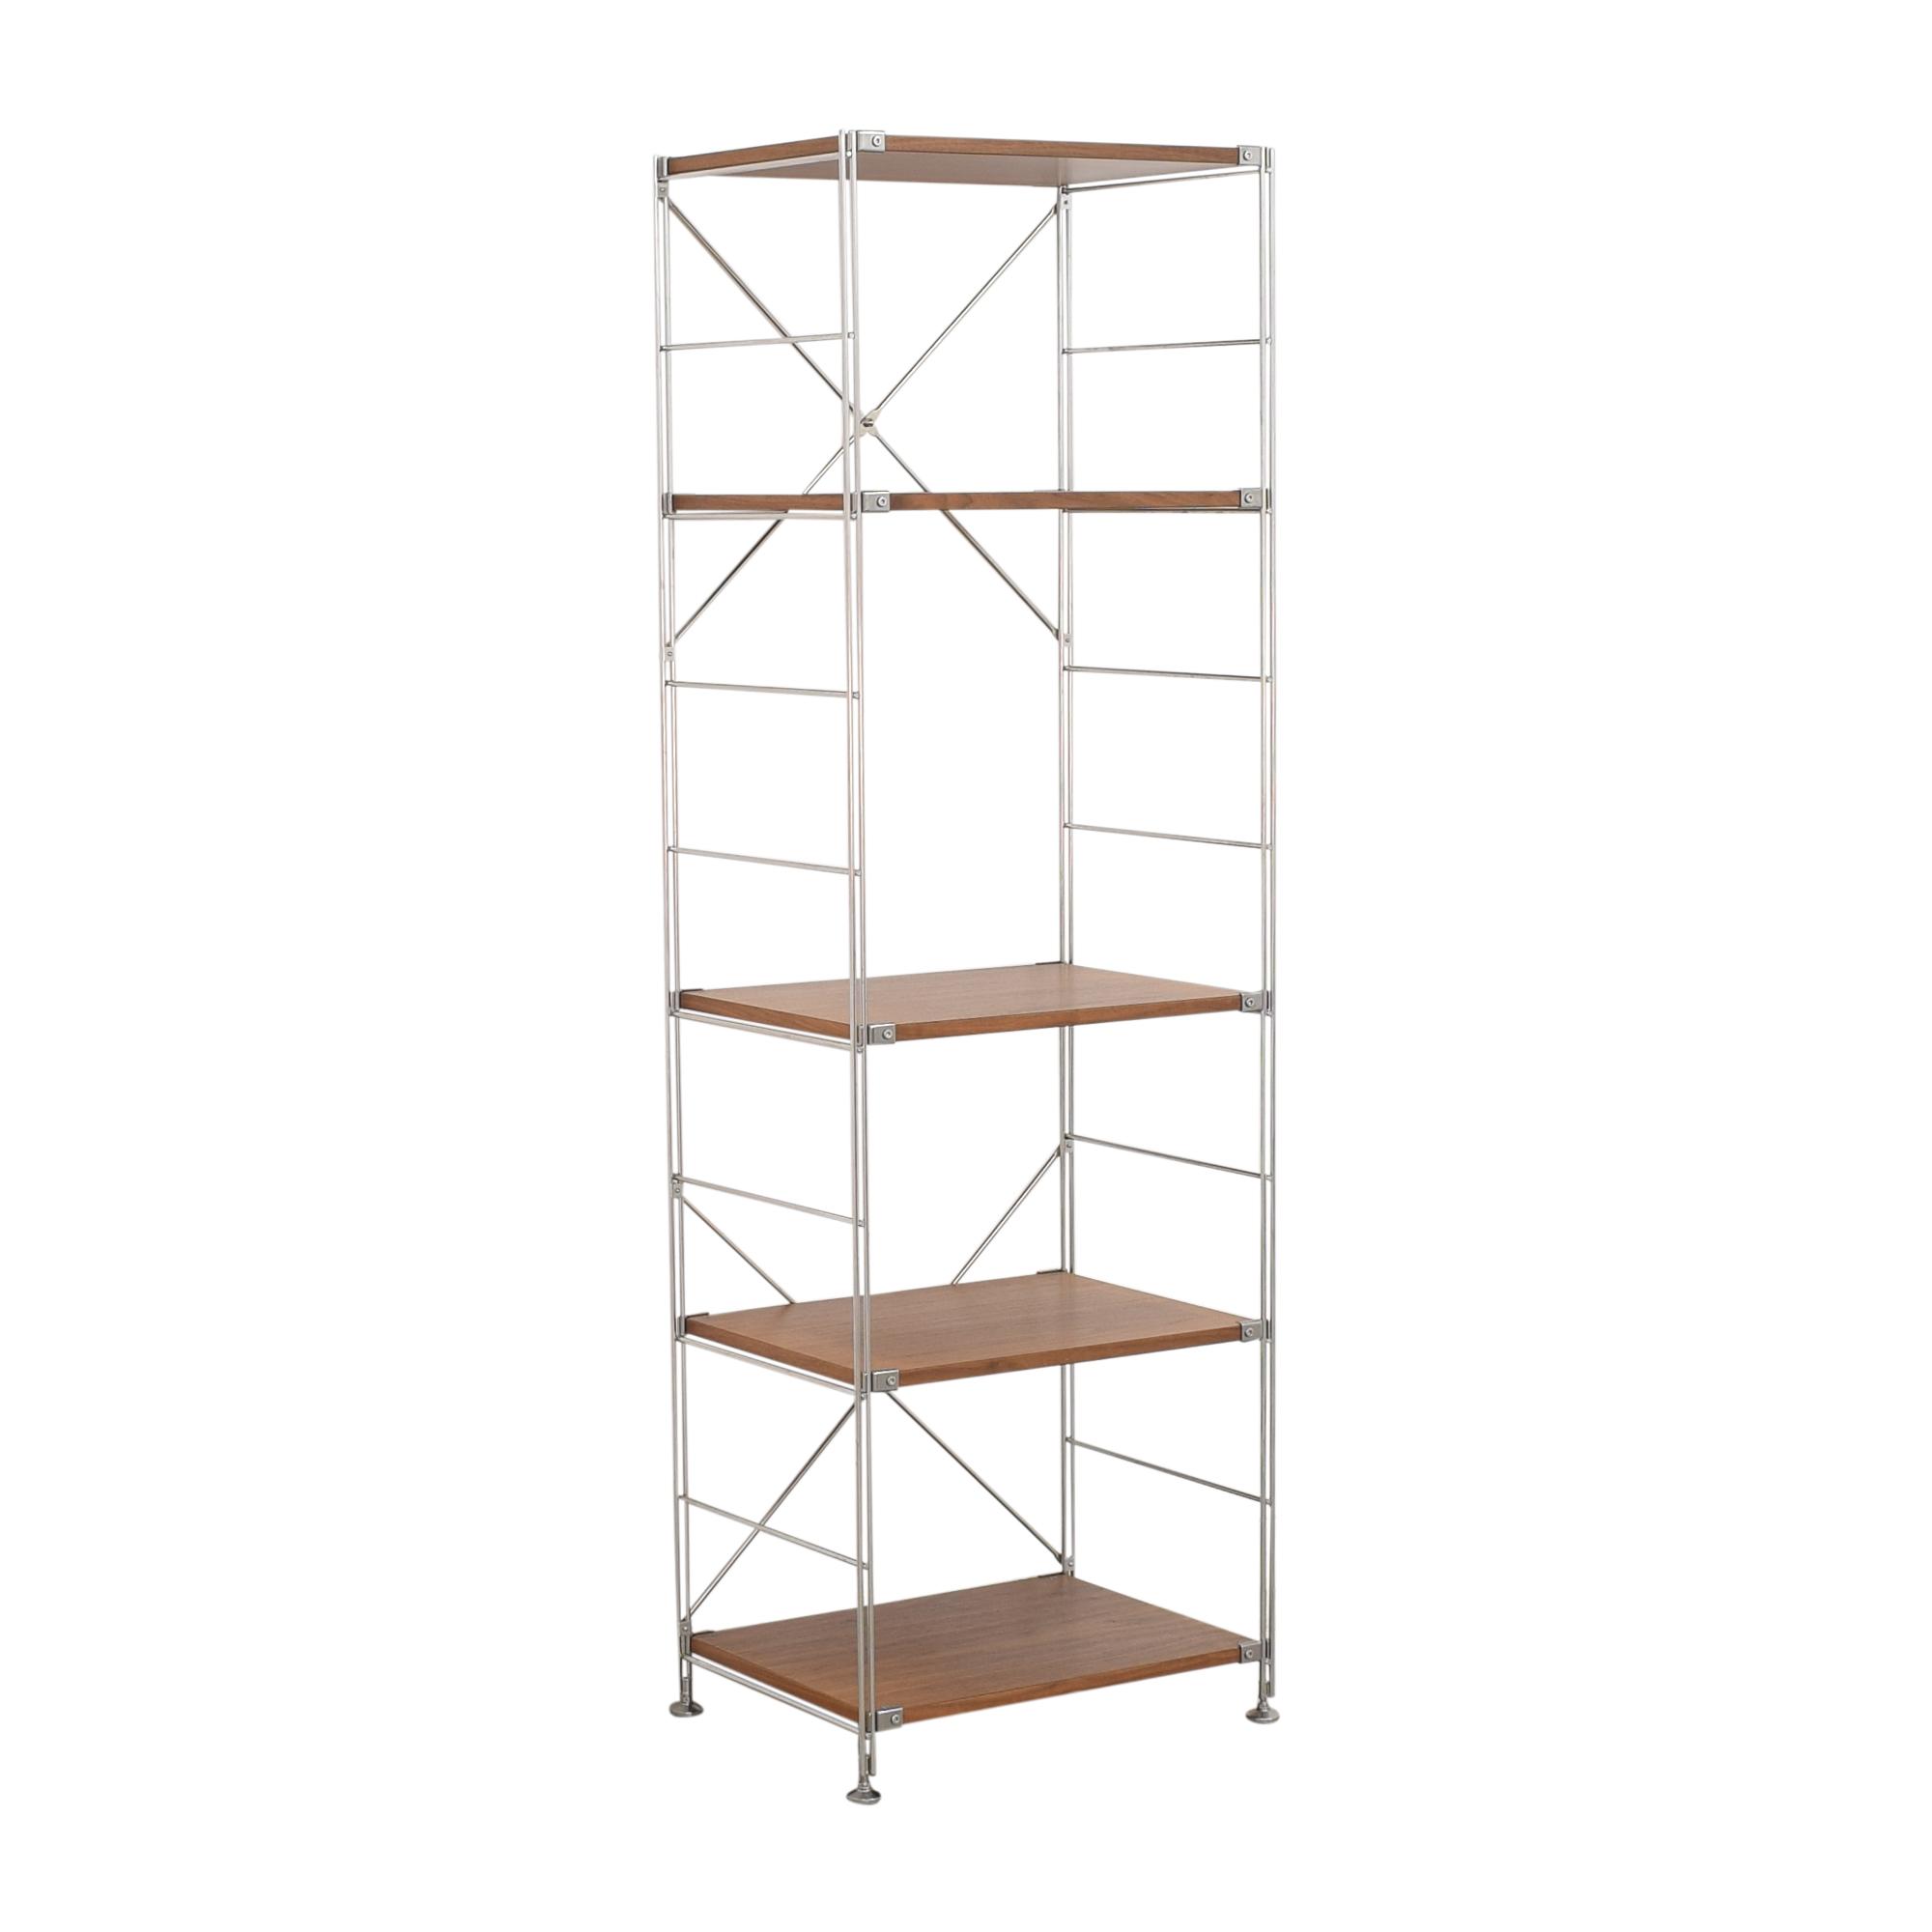 Muji Muji Minimalist Shelf Set ct